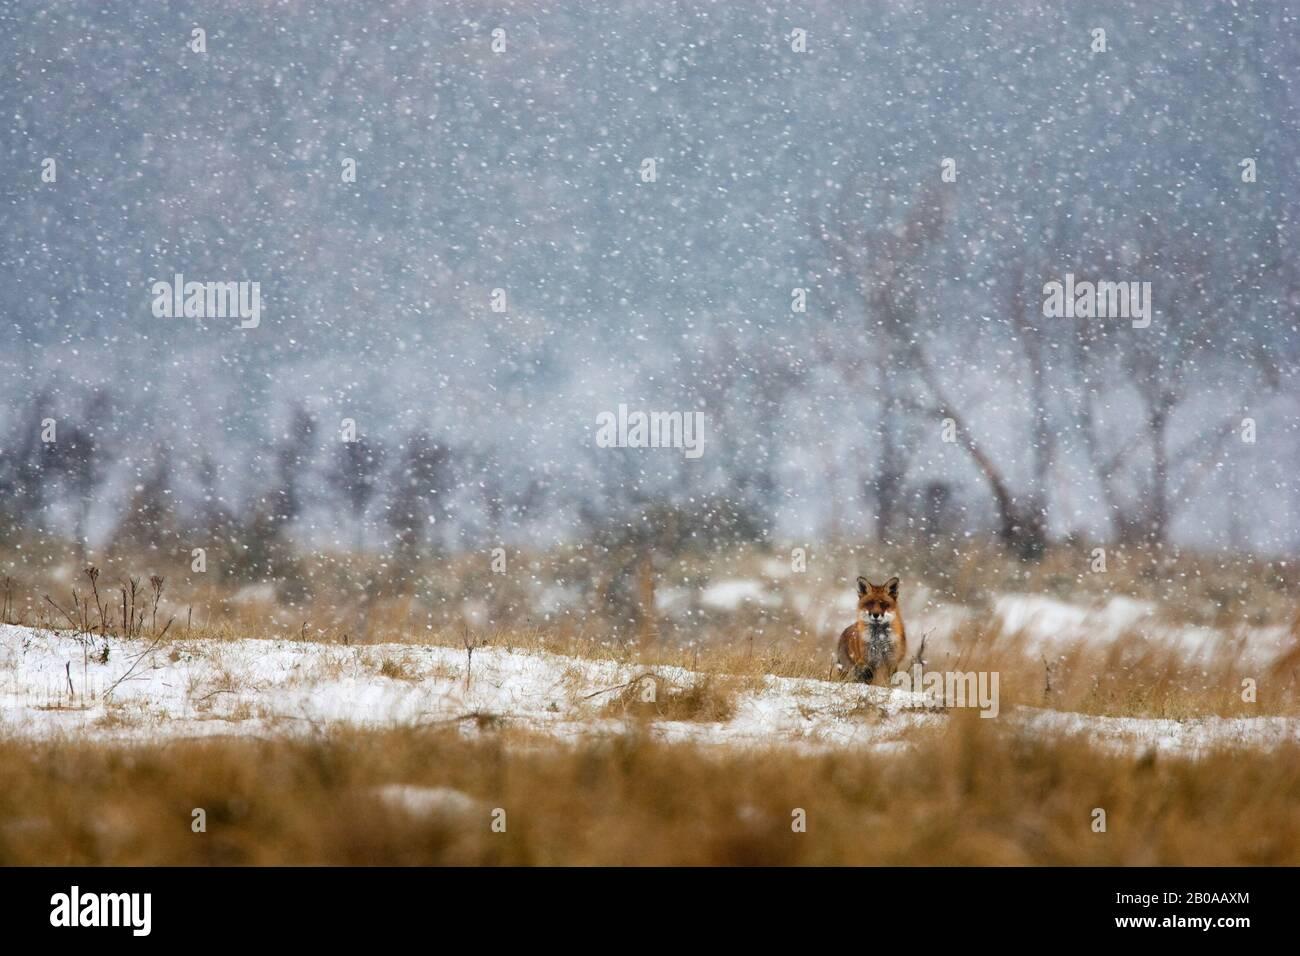 Rotfuchs (Vulpes vulpes), im Schneefall im Winter, Niederlande Stockfoto